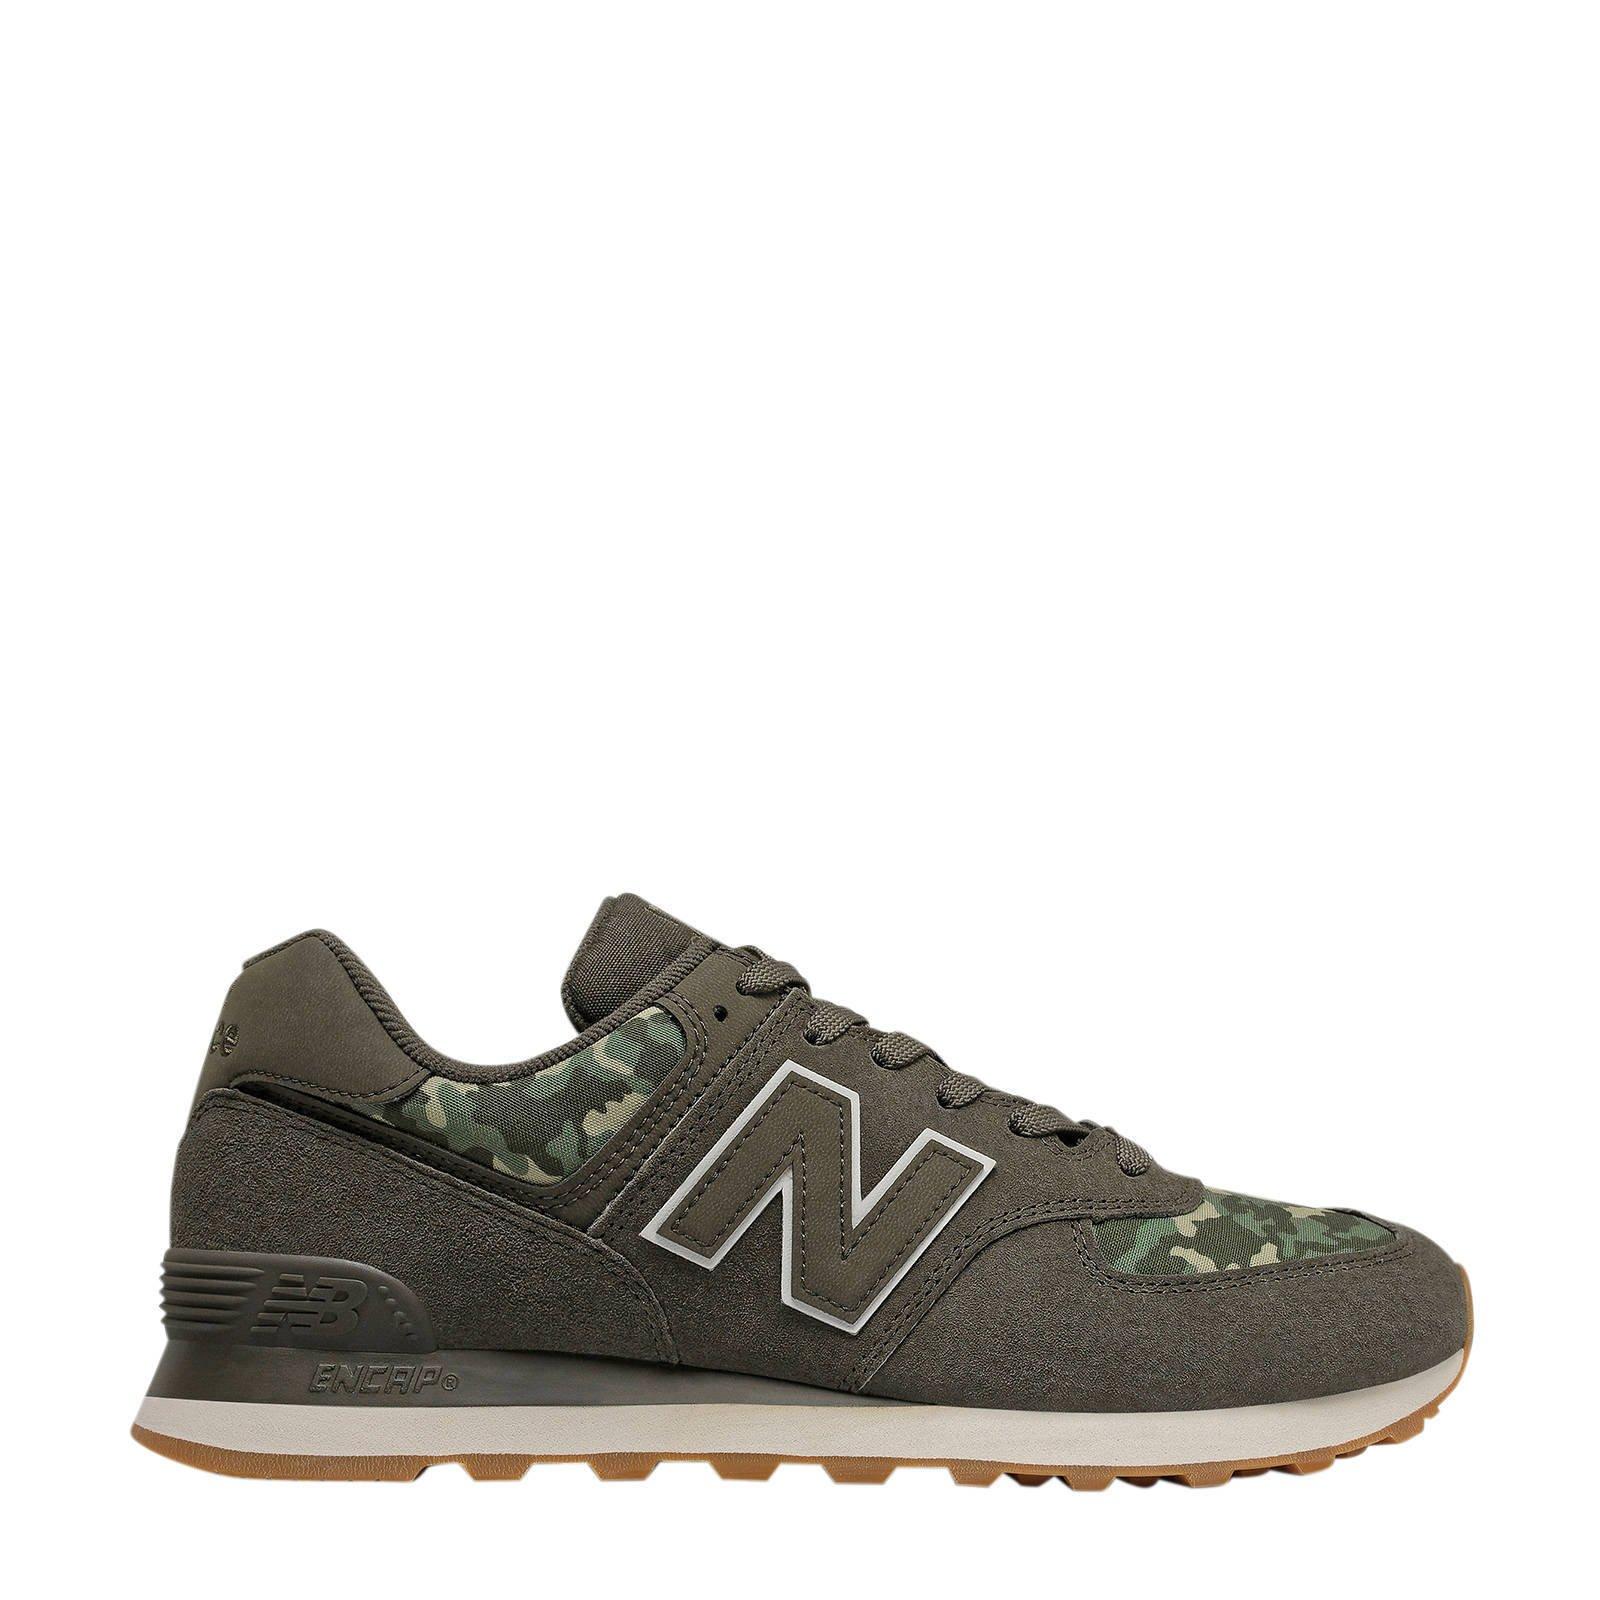 New Balance 574 sneakers camouflage groen/donkergroen | wehkamp